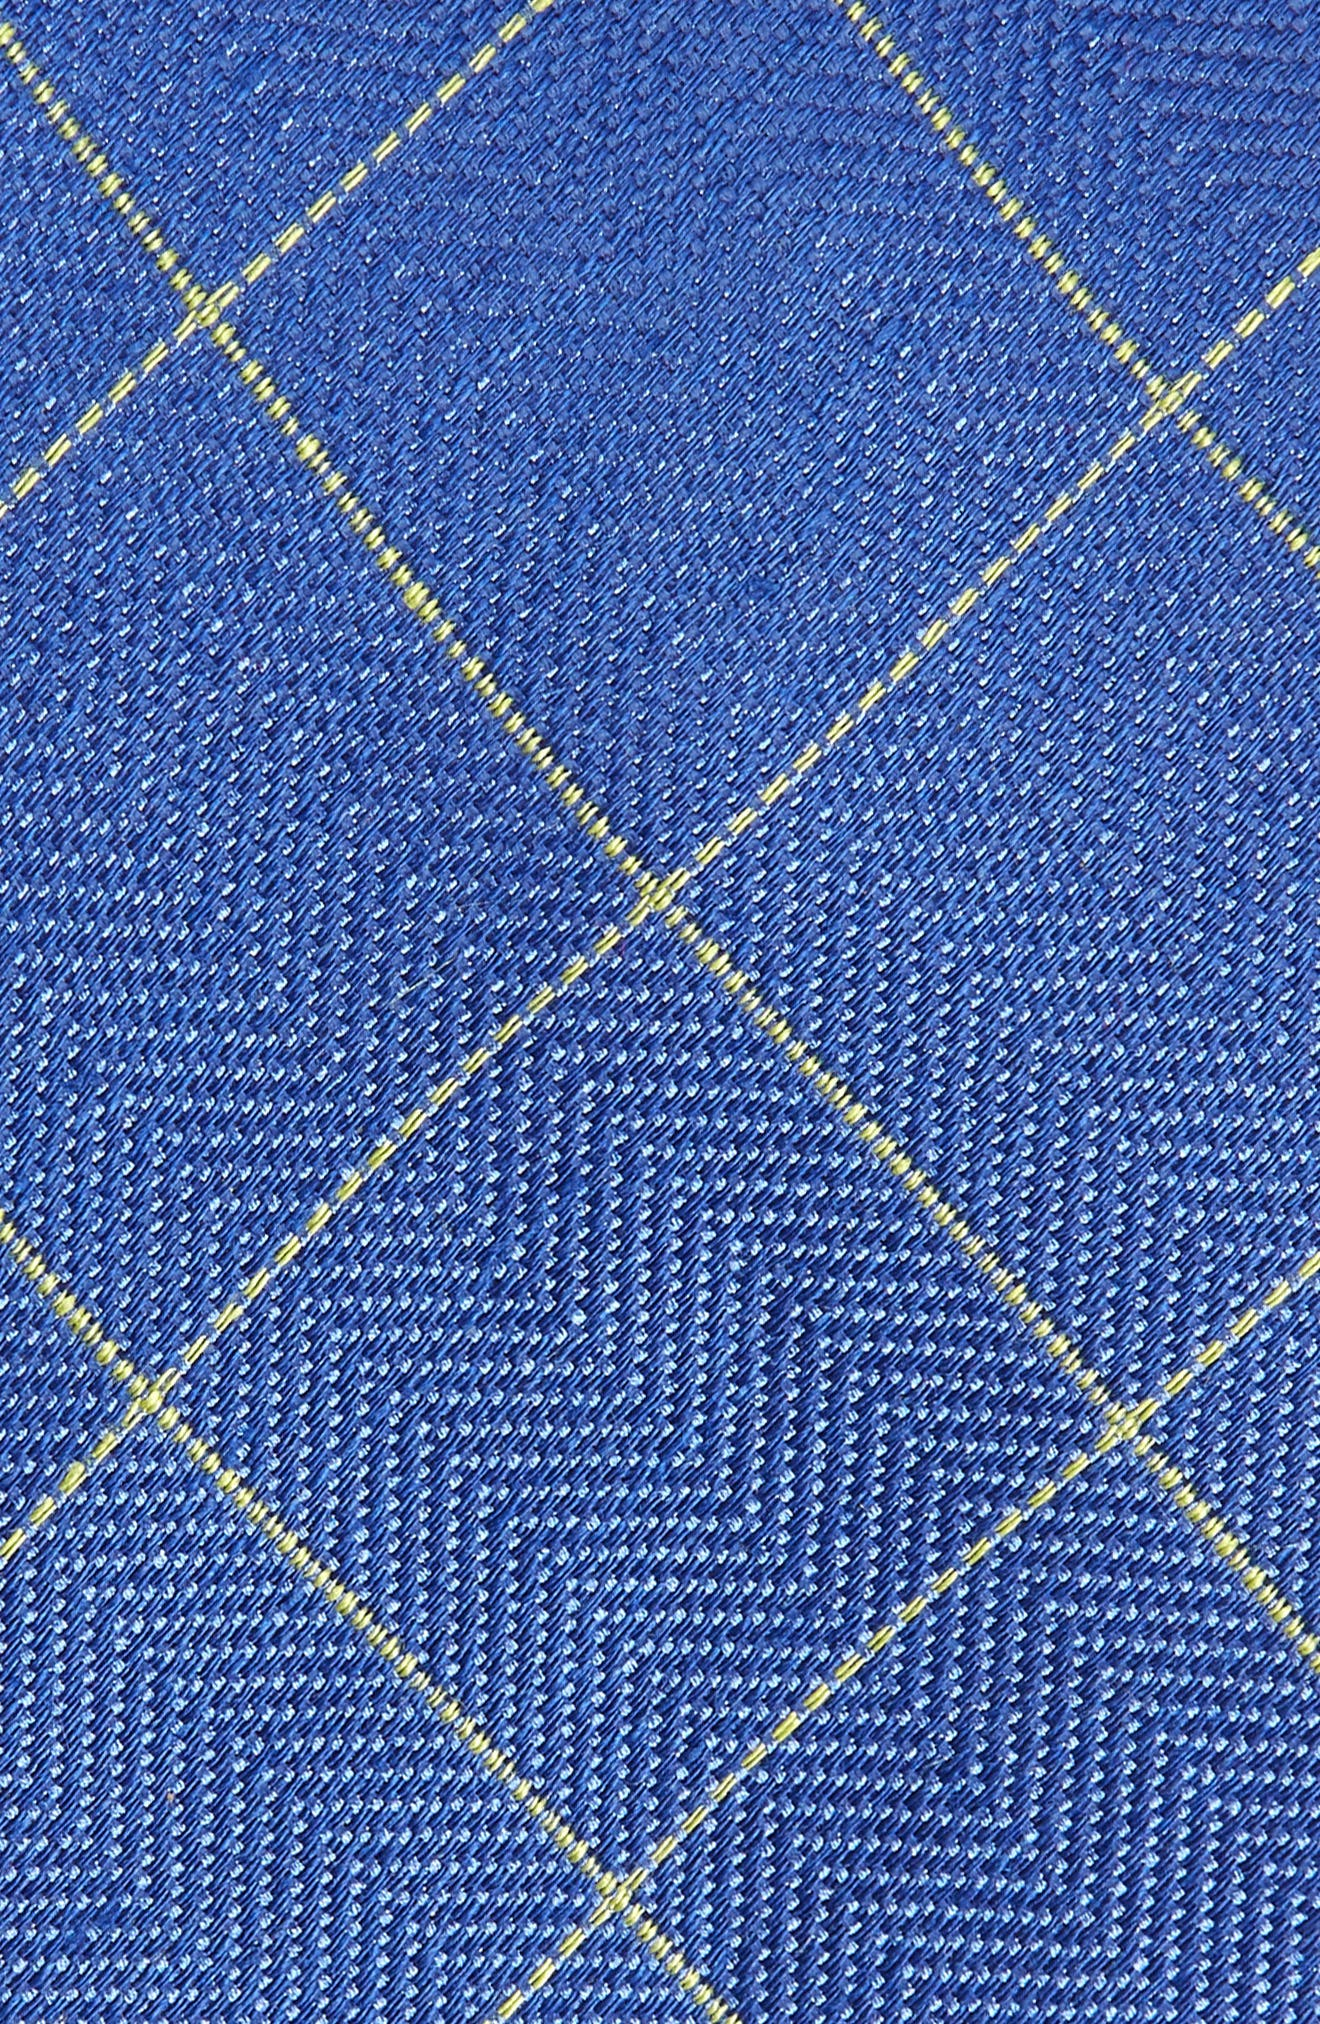 Windowpane Silk & Linen Tie,                             Alternate thumbnail 2, color,                             423